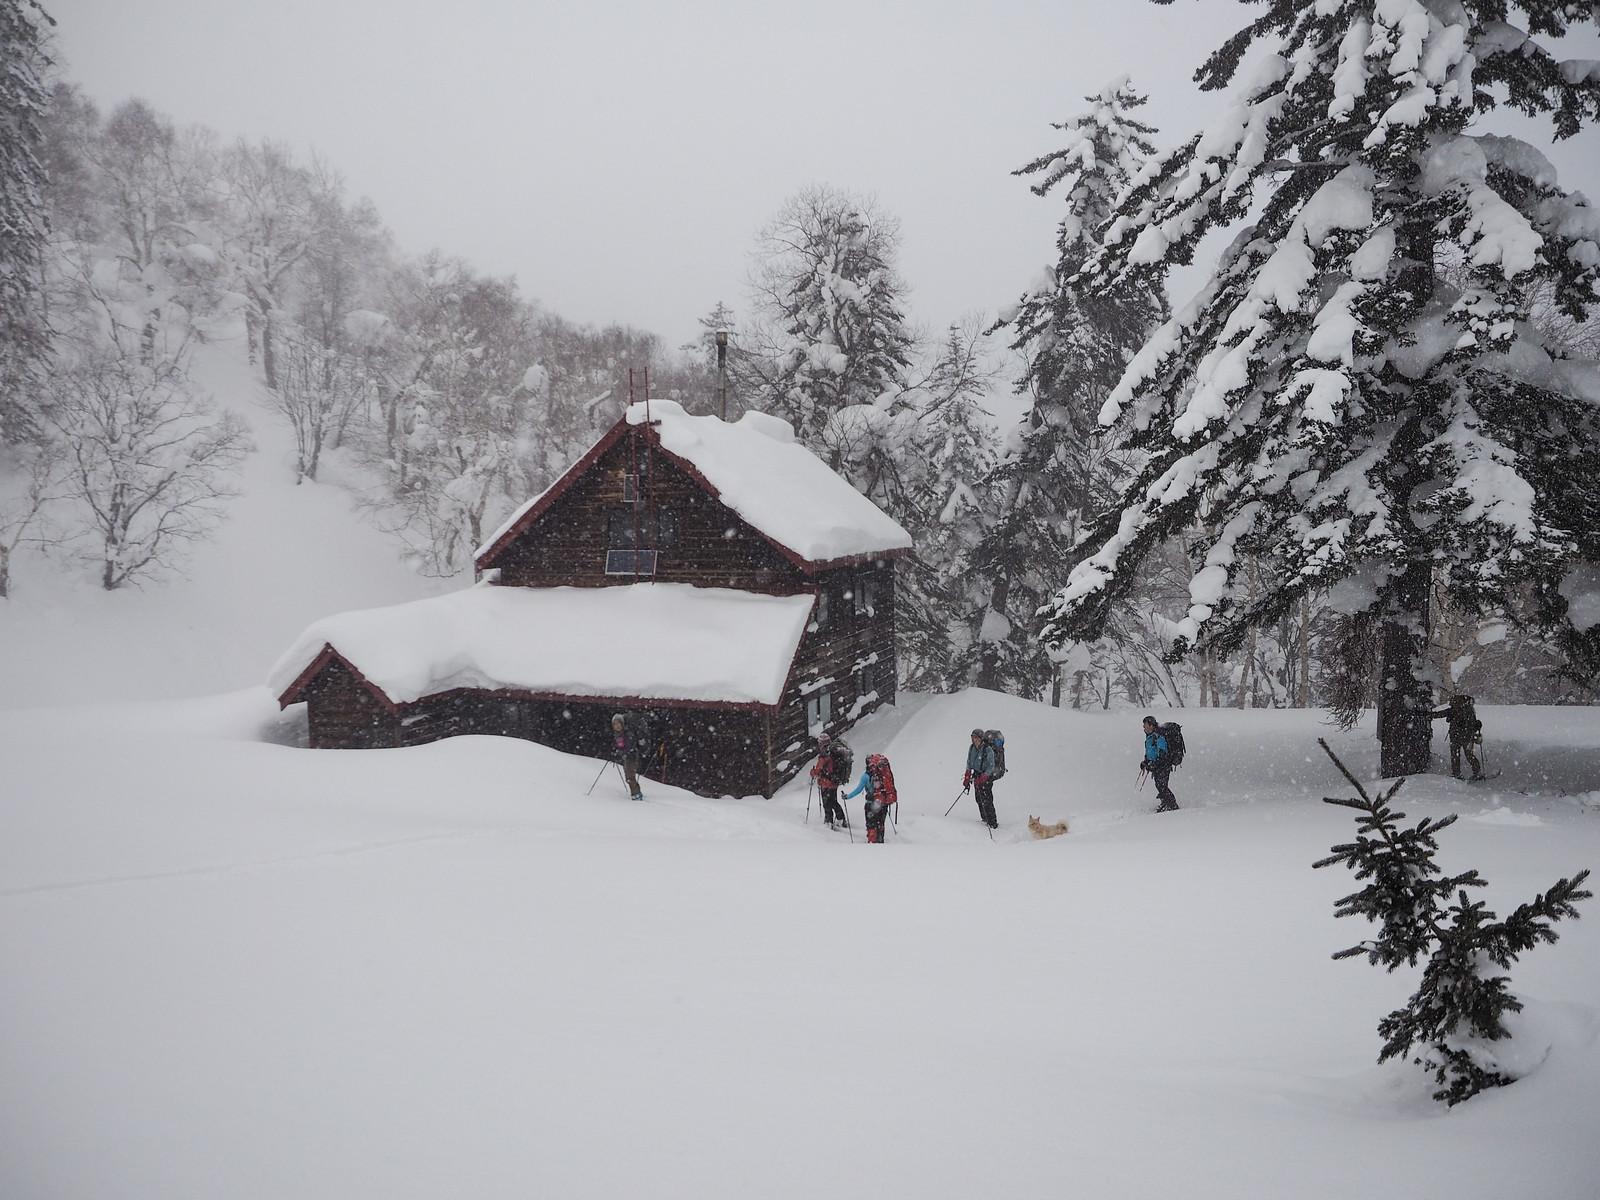 Okuteine Hut and Yutopia Piste (Hokkaido, Japan)